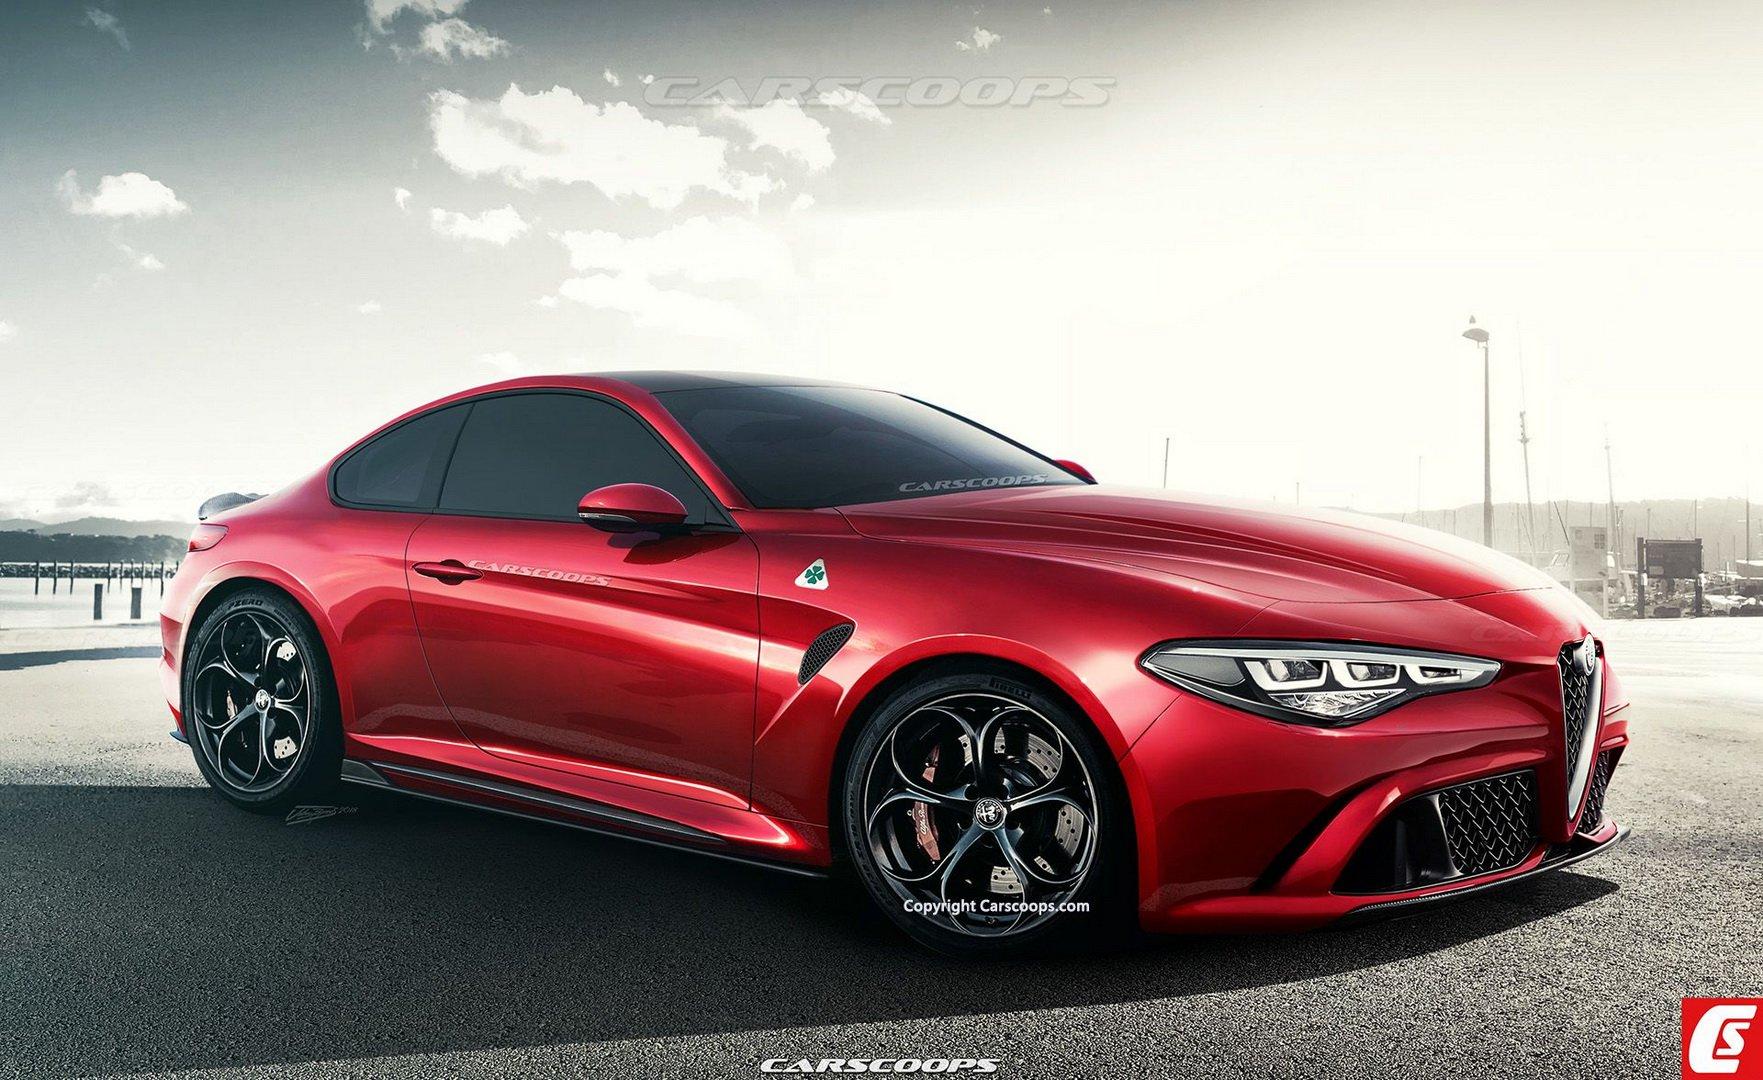 Гибридный суперкар Alfa Romeo GTV появится в 2021 году 1